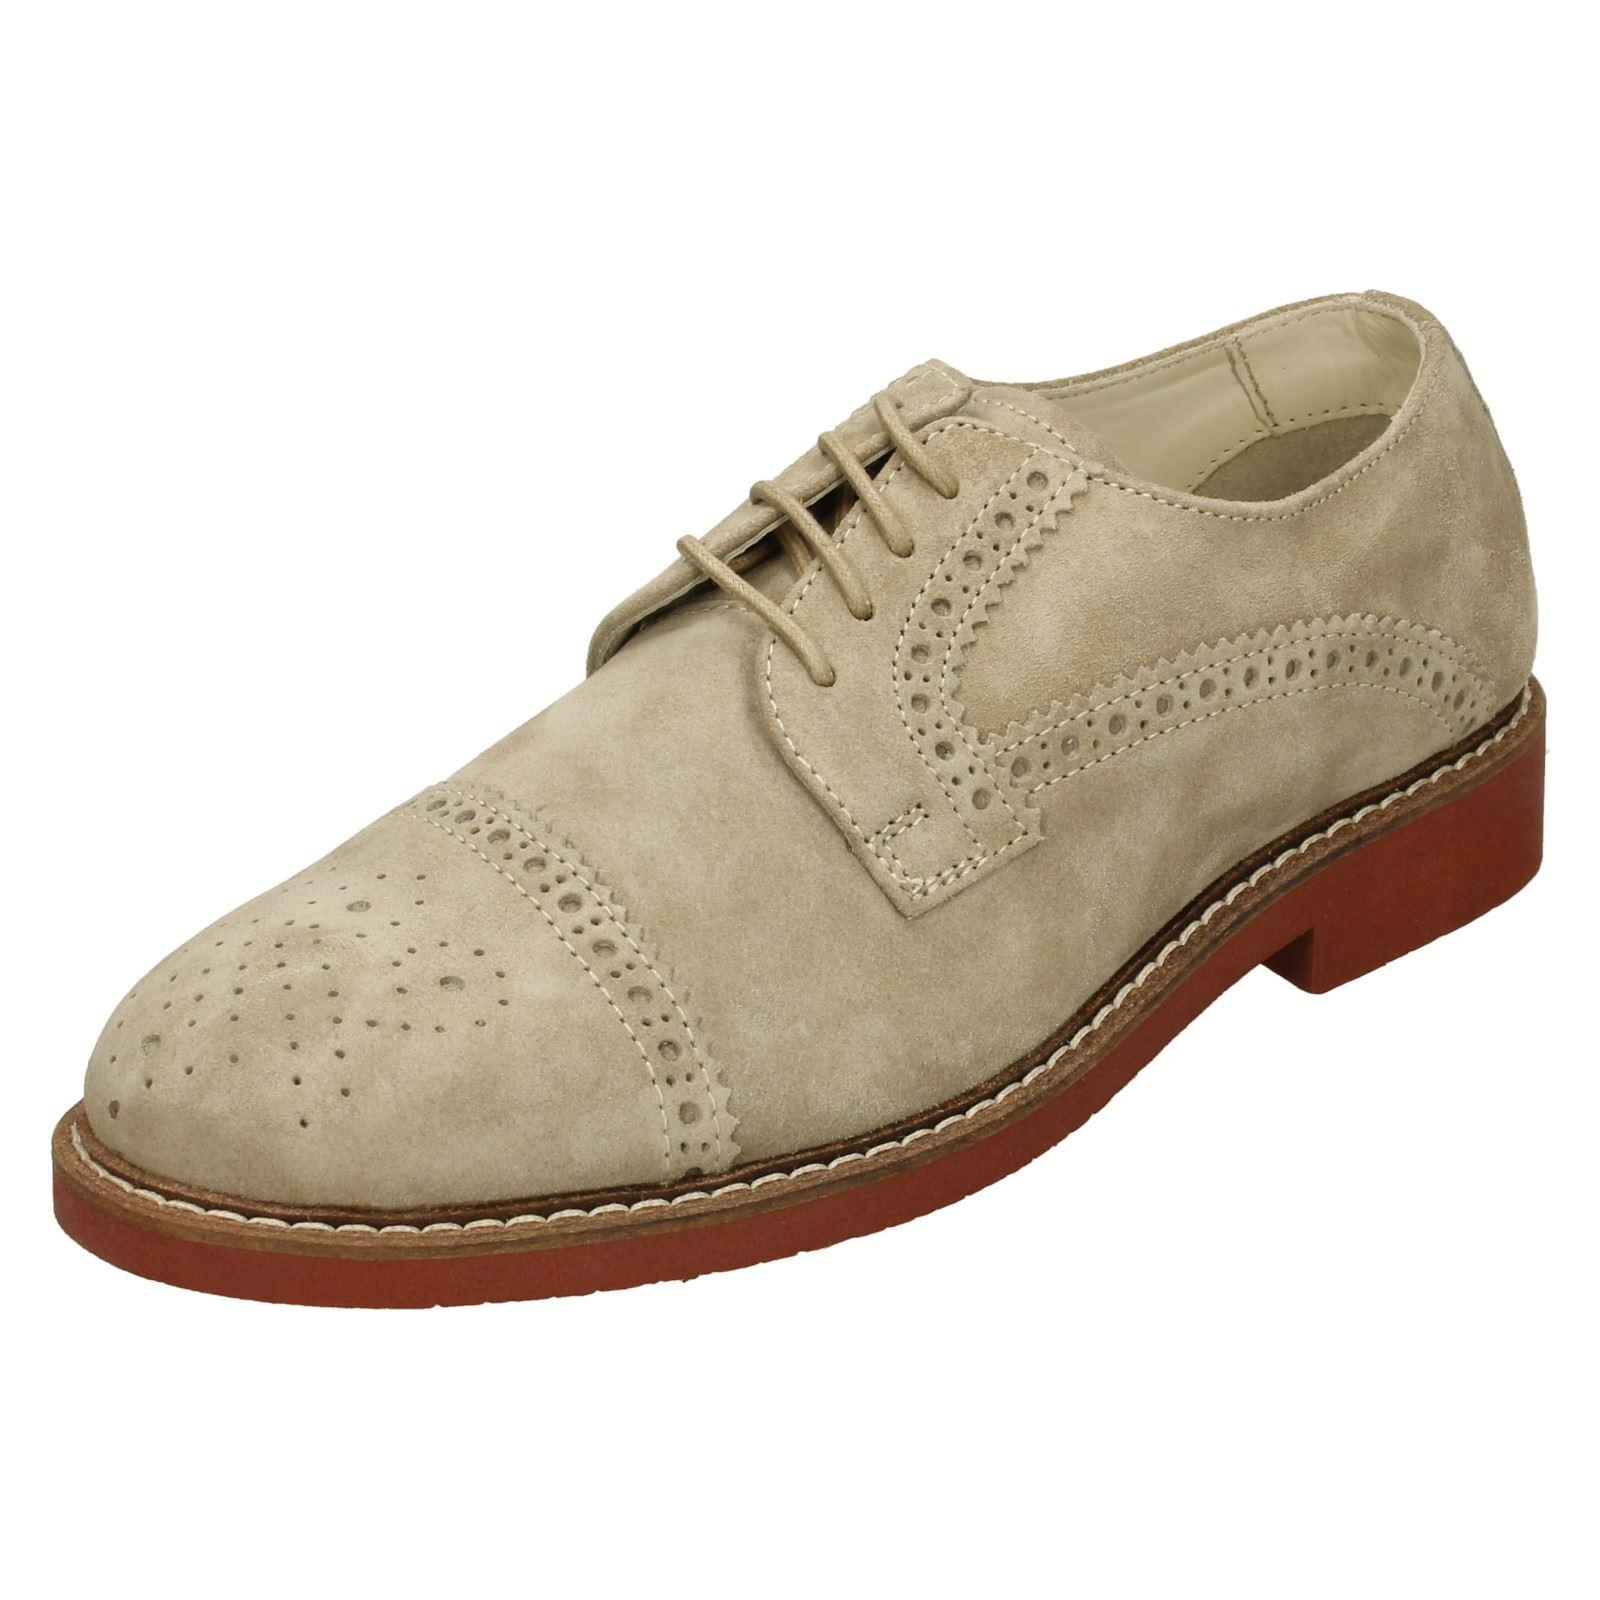 mens am shoe company am275 casual brogue shoes. Black Bedroom Furniture Sets. Home Design Ideas